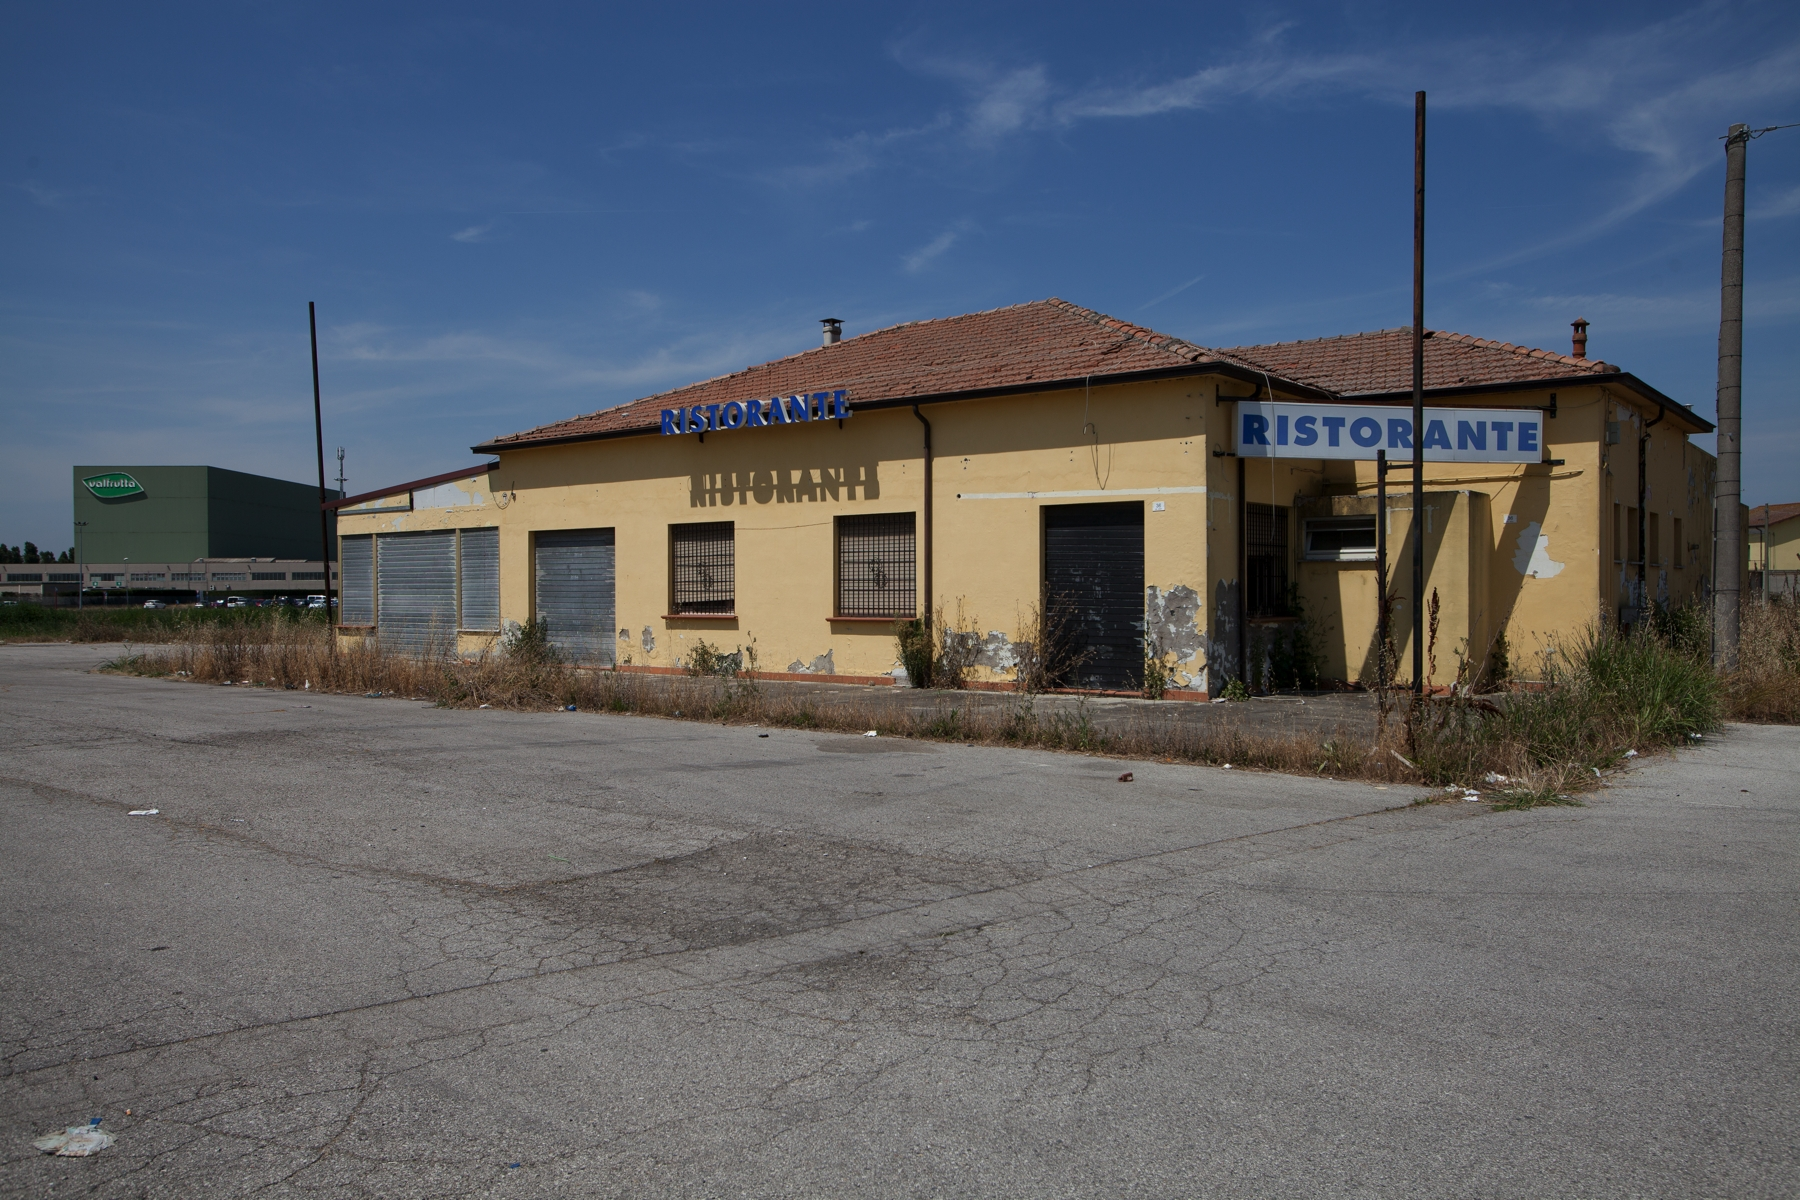 Ristorante Romea-19.jpg